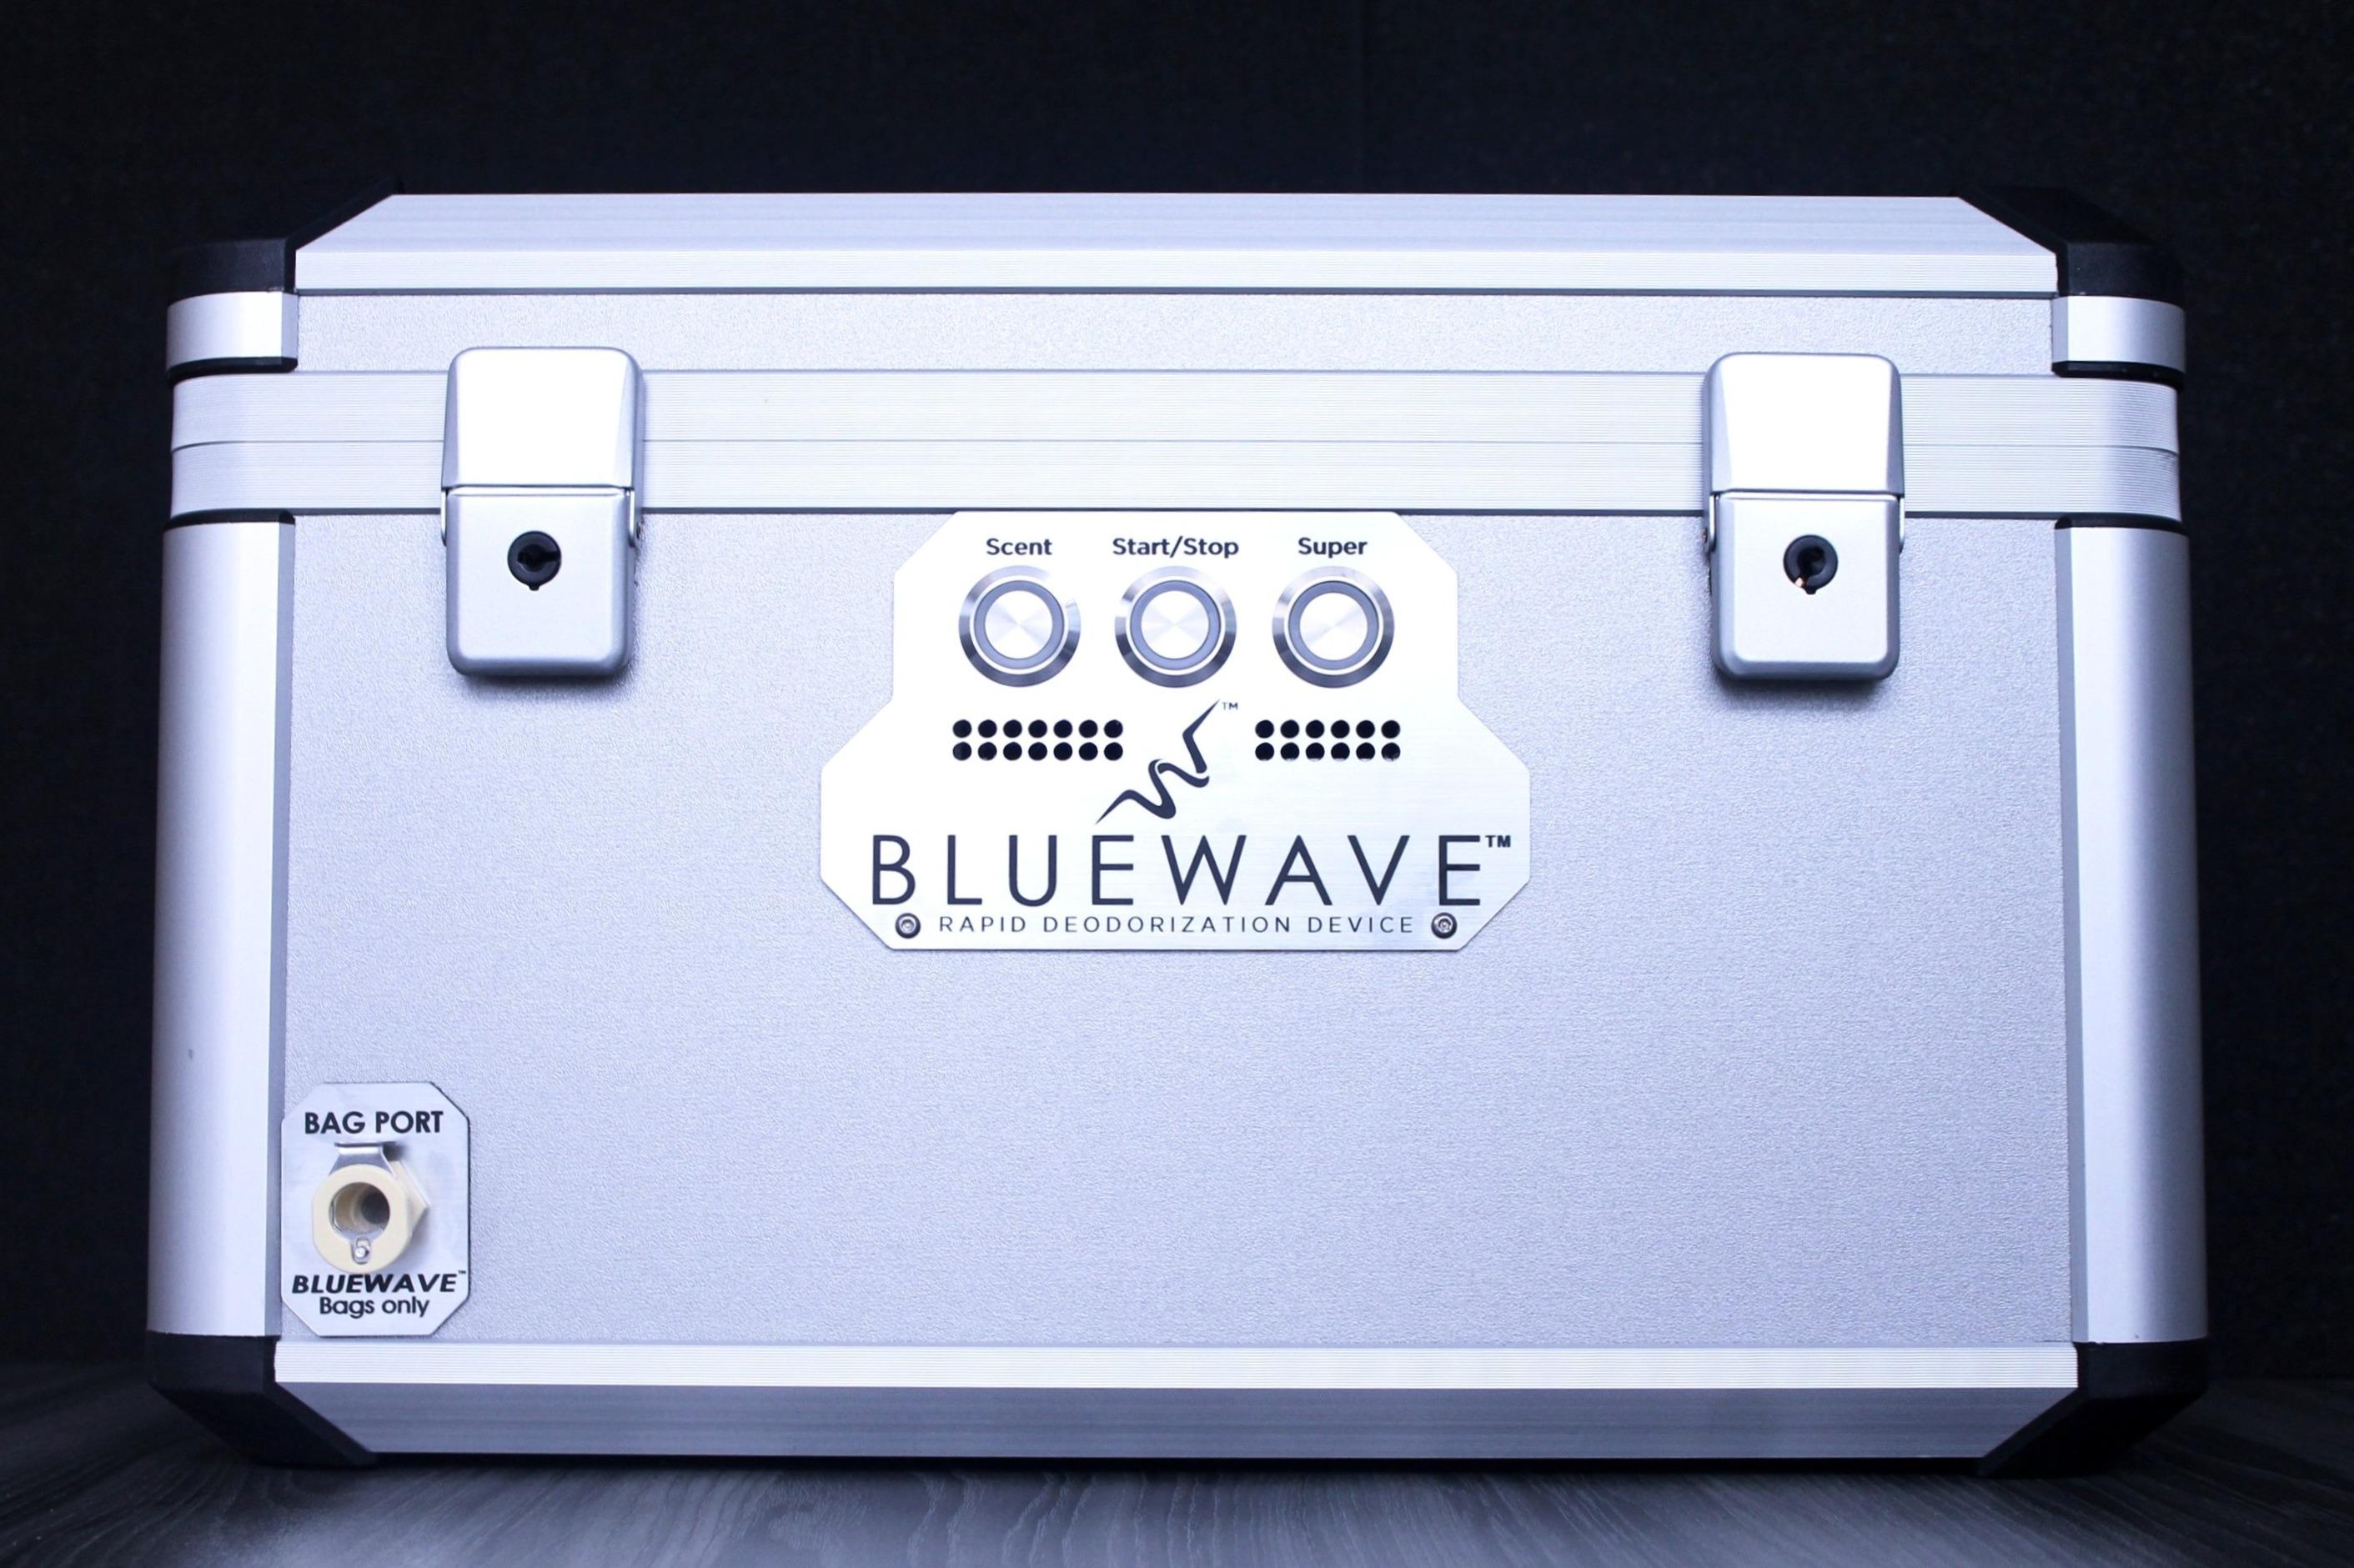 BLUEWAVE Rapid Deodorization Device